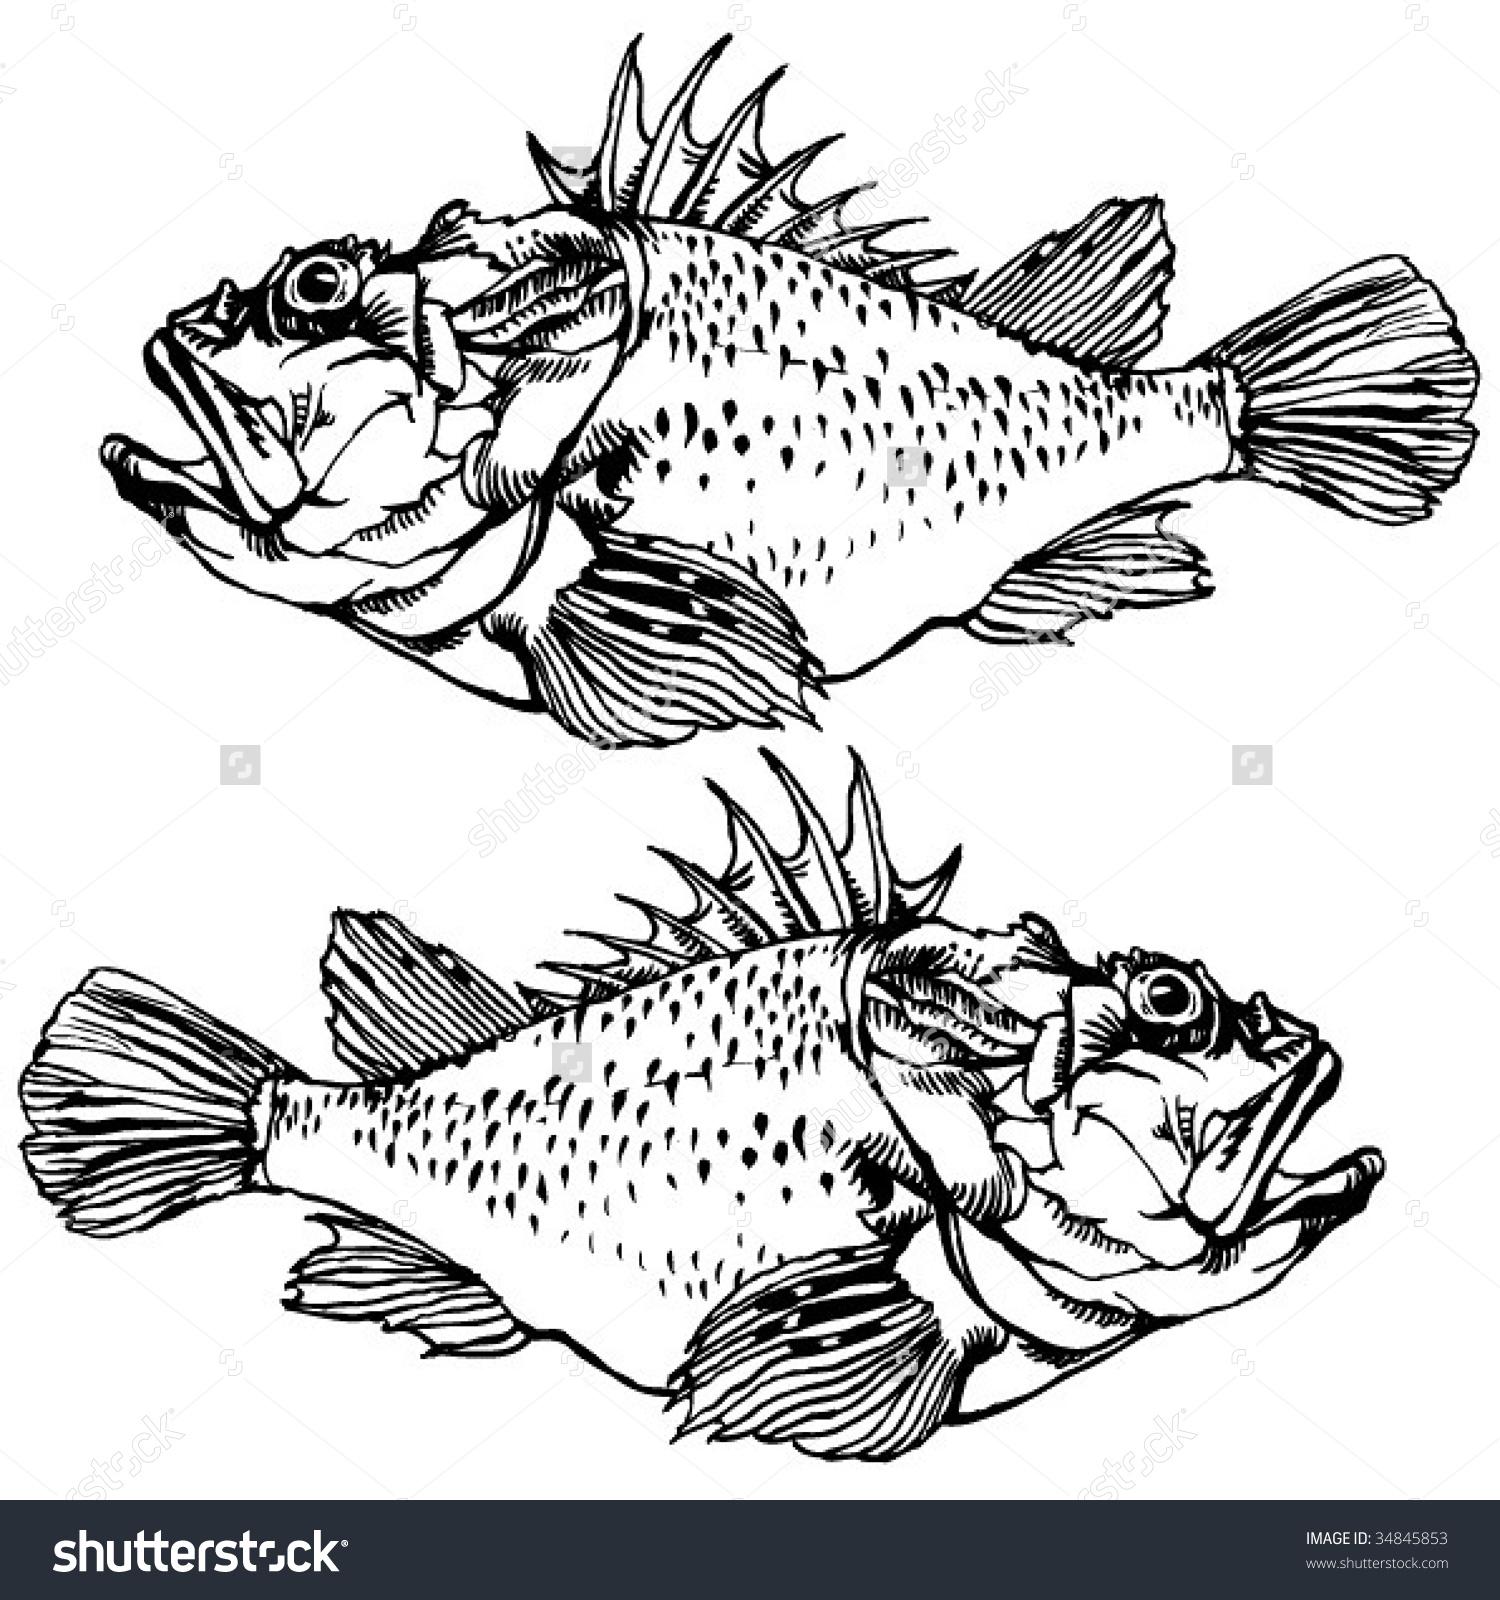 Scorpionfish Drawing Stock Vector 34845853.